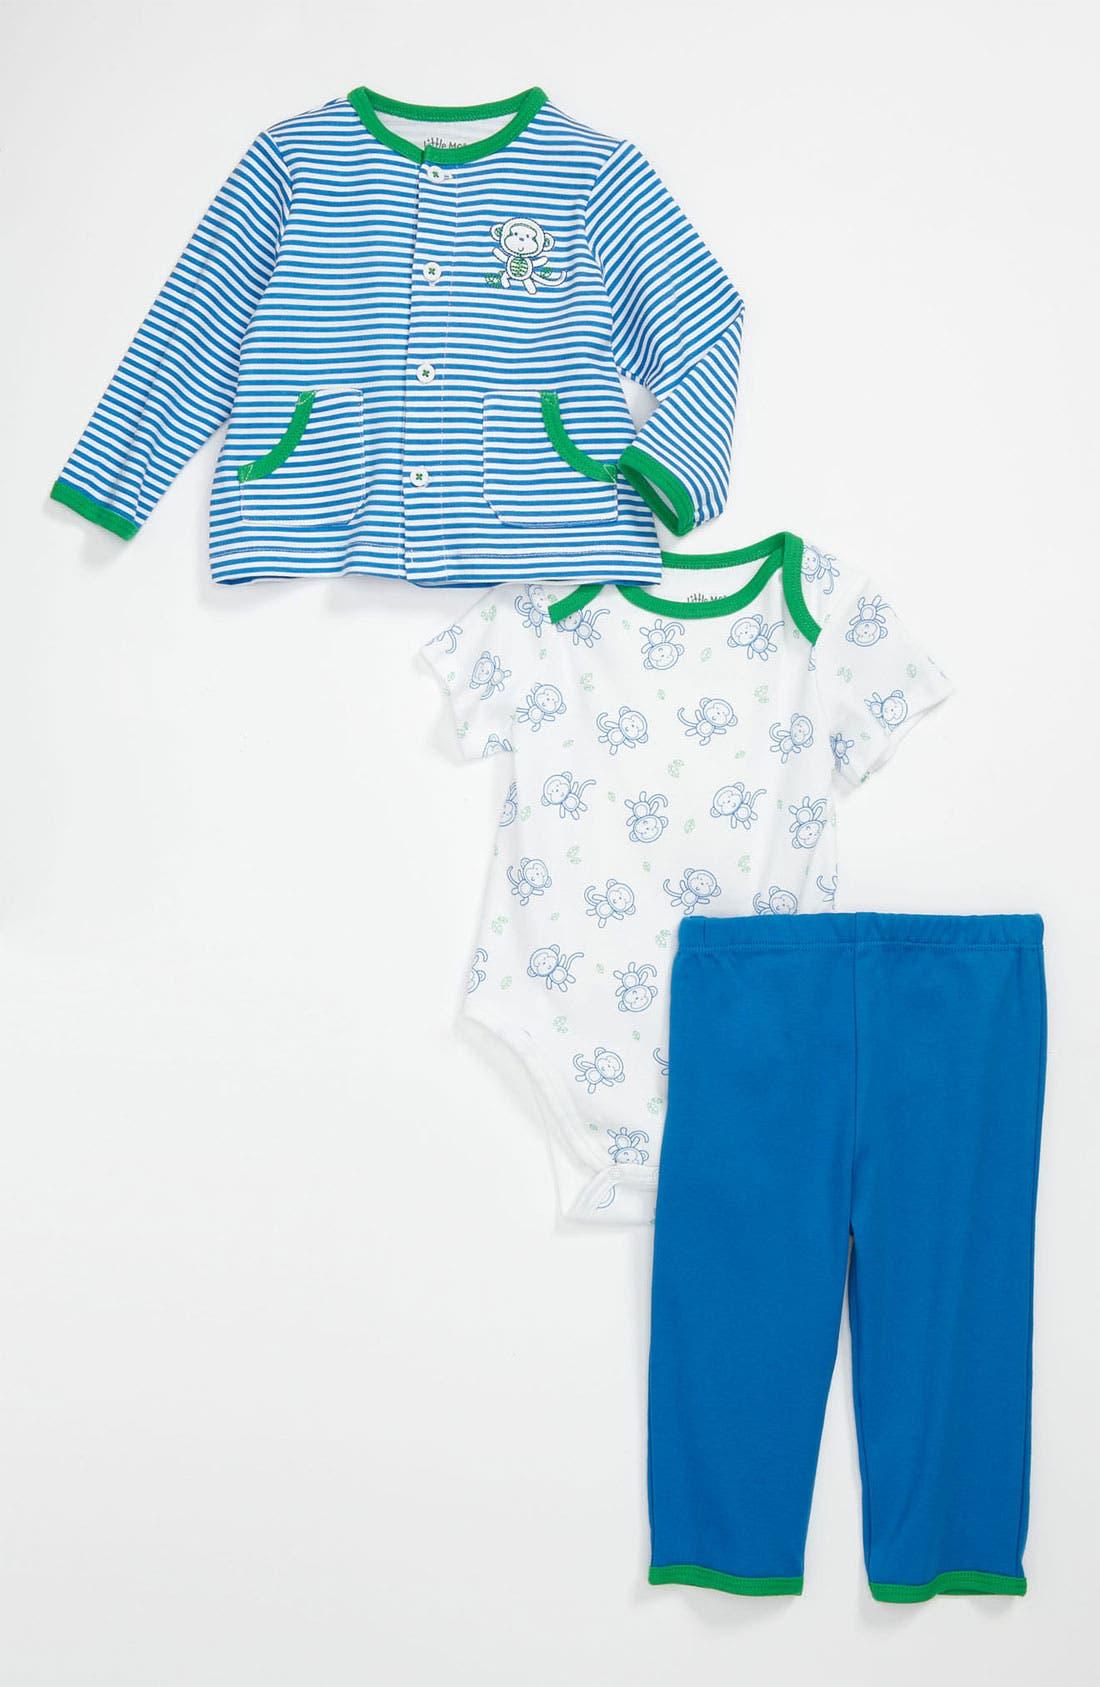 Main Image - Little Me 'Take Me Home' Bodysuit, Cardigan & Pants (Infant)